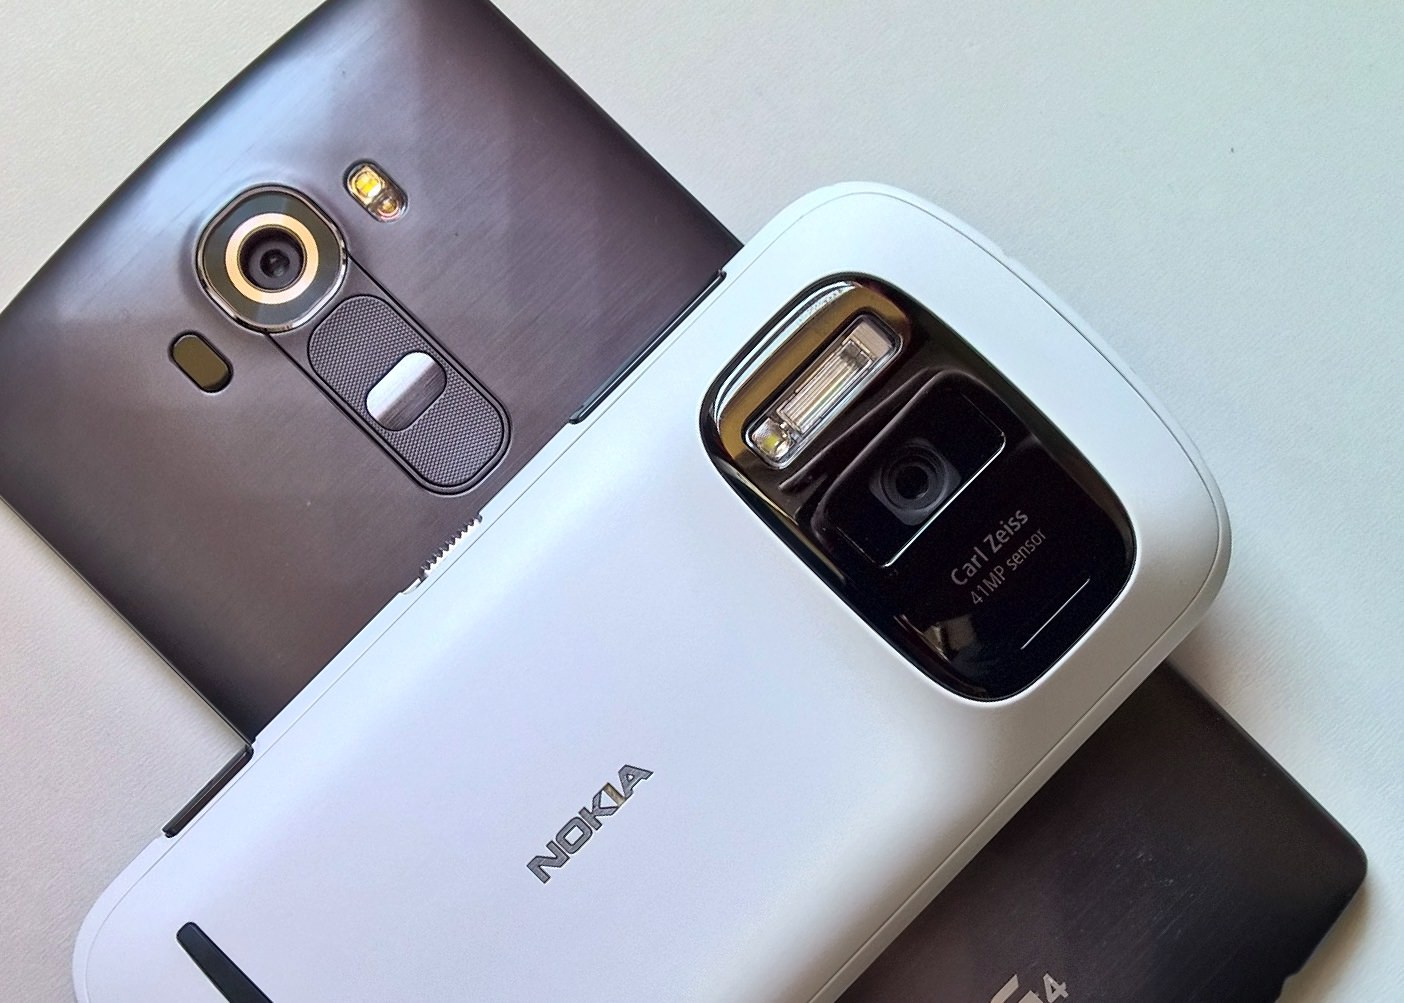 Nokia 808 (2012) vs LG G4 (2015) camera data points (updated)